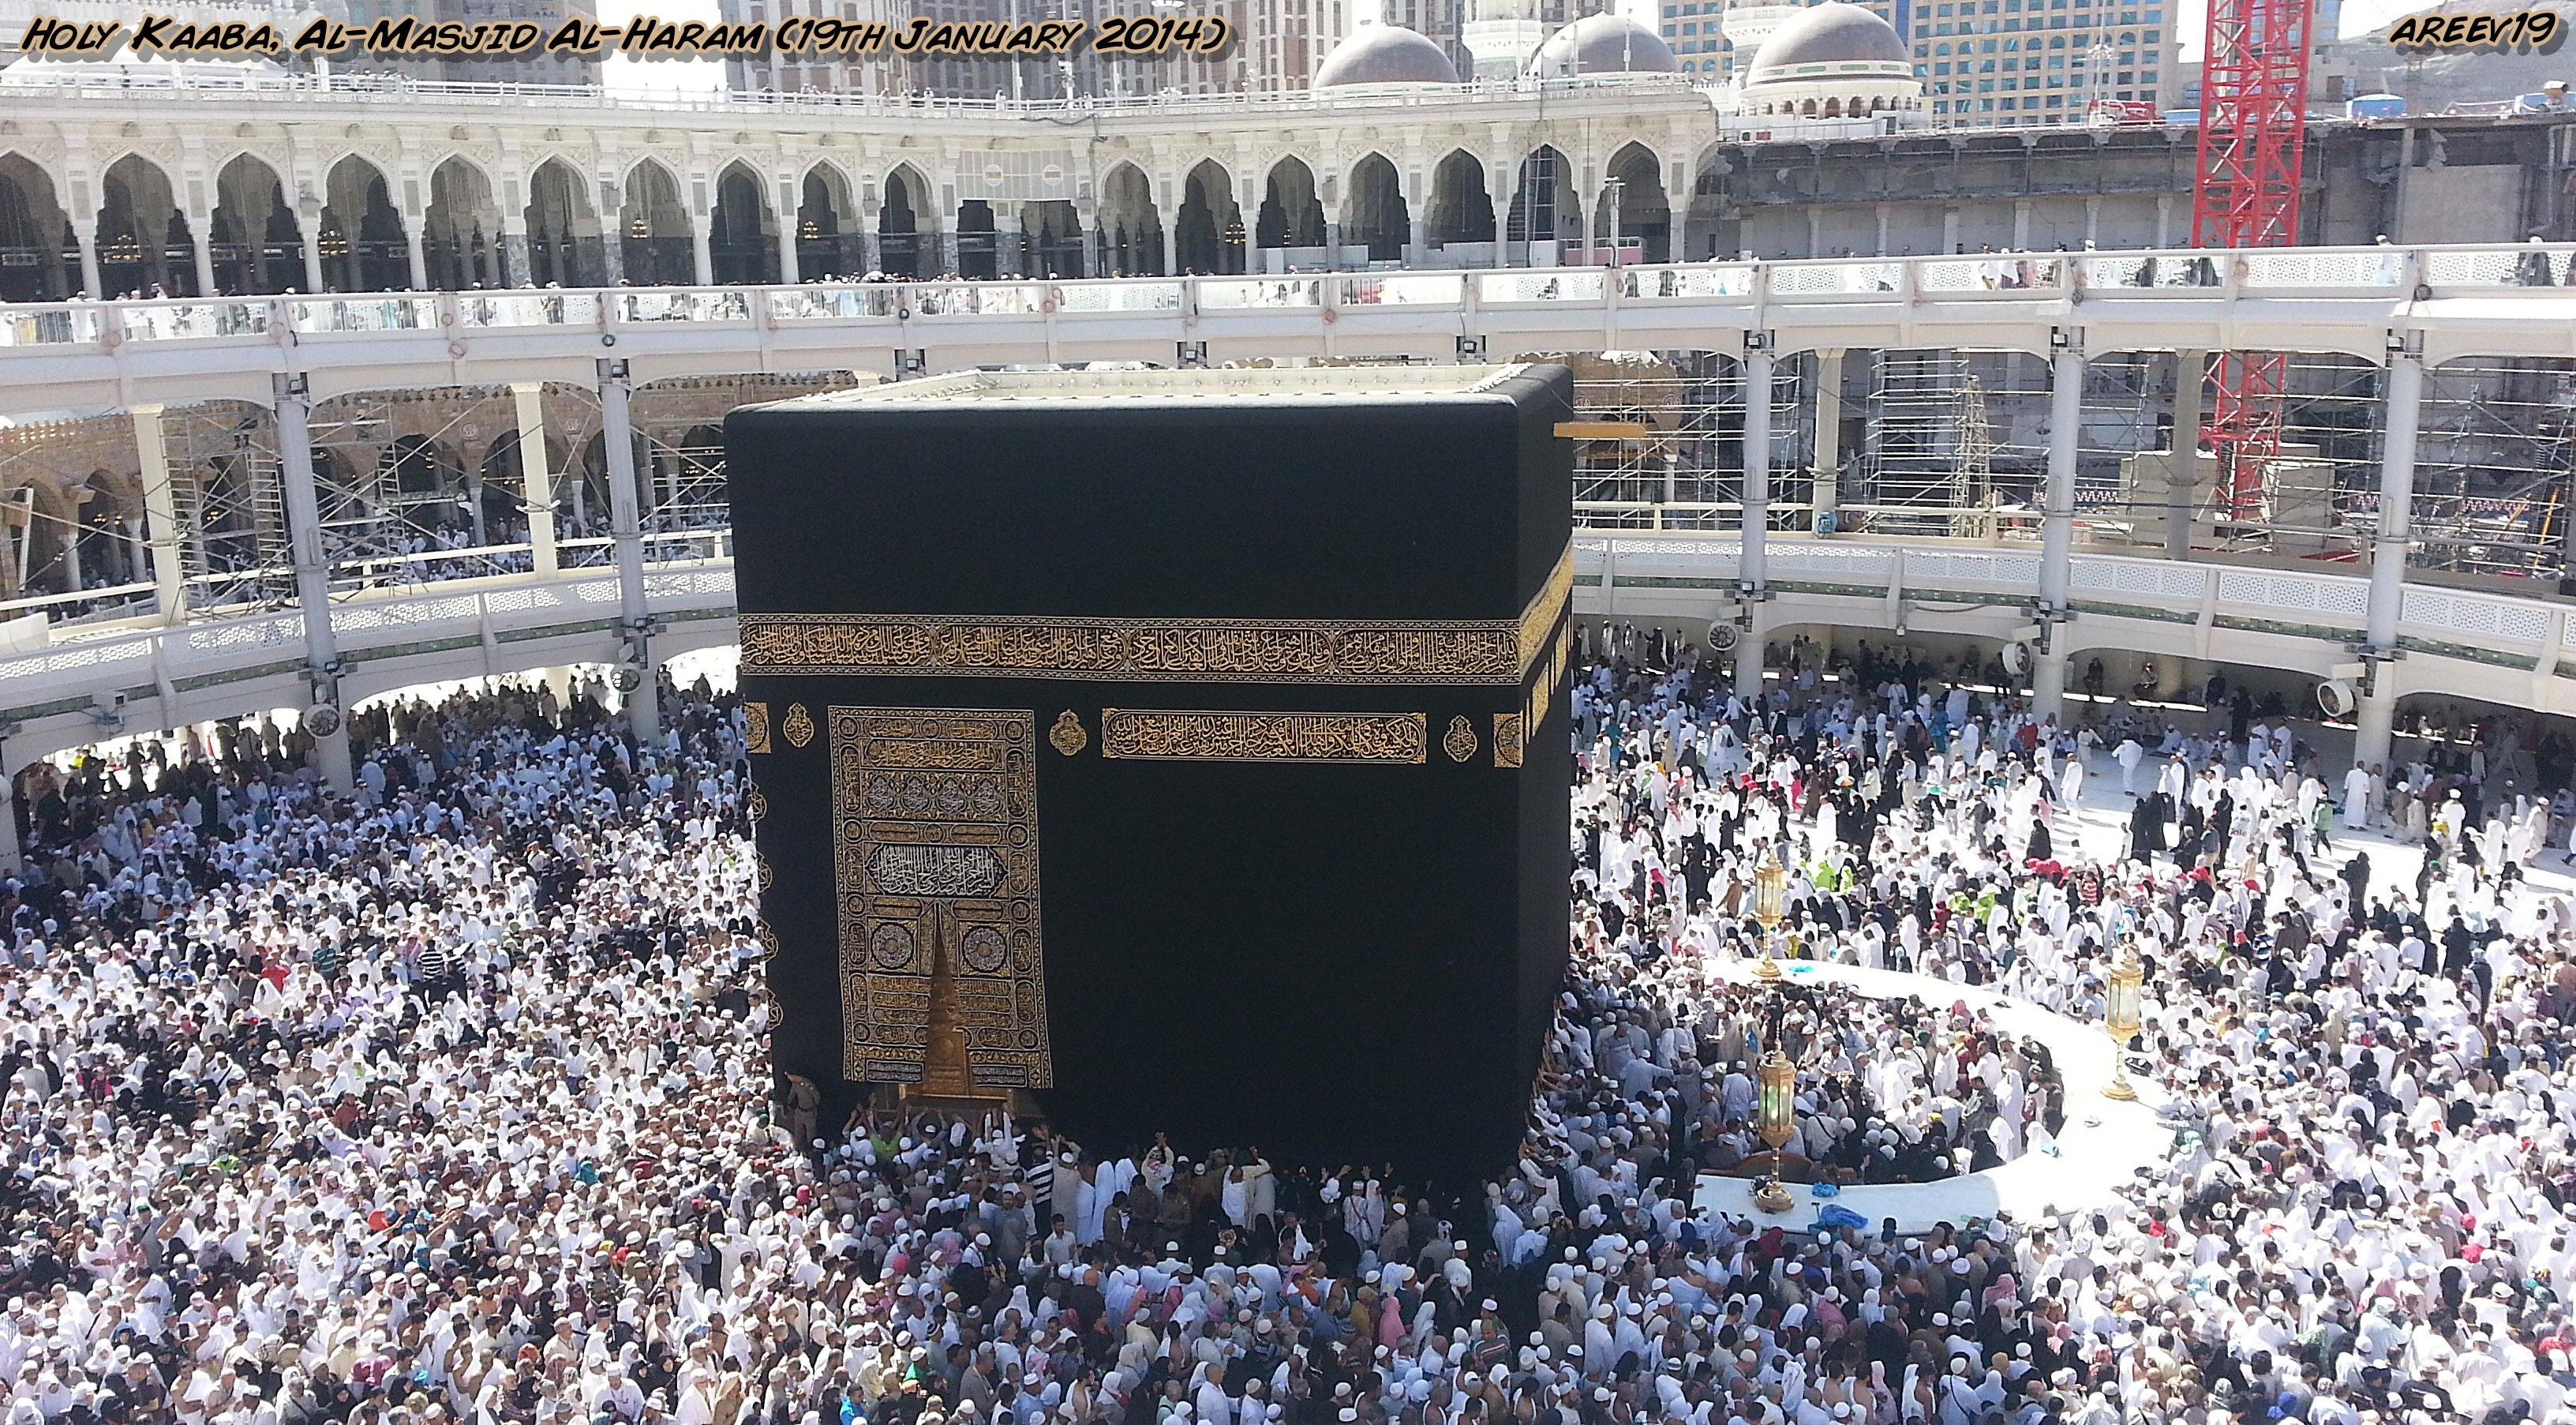 Holy Kaaba , Al-Masjid Al-Haram by areev19